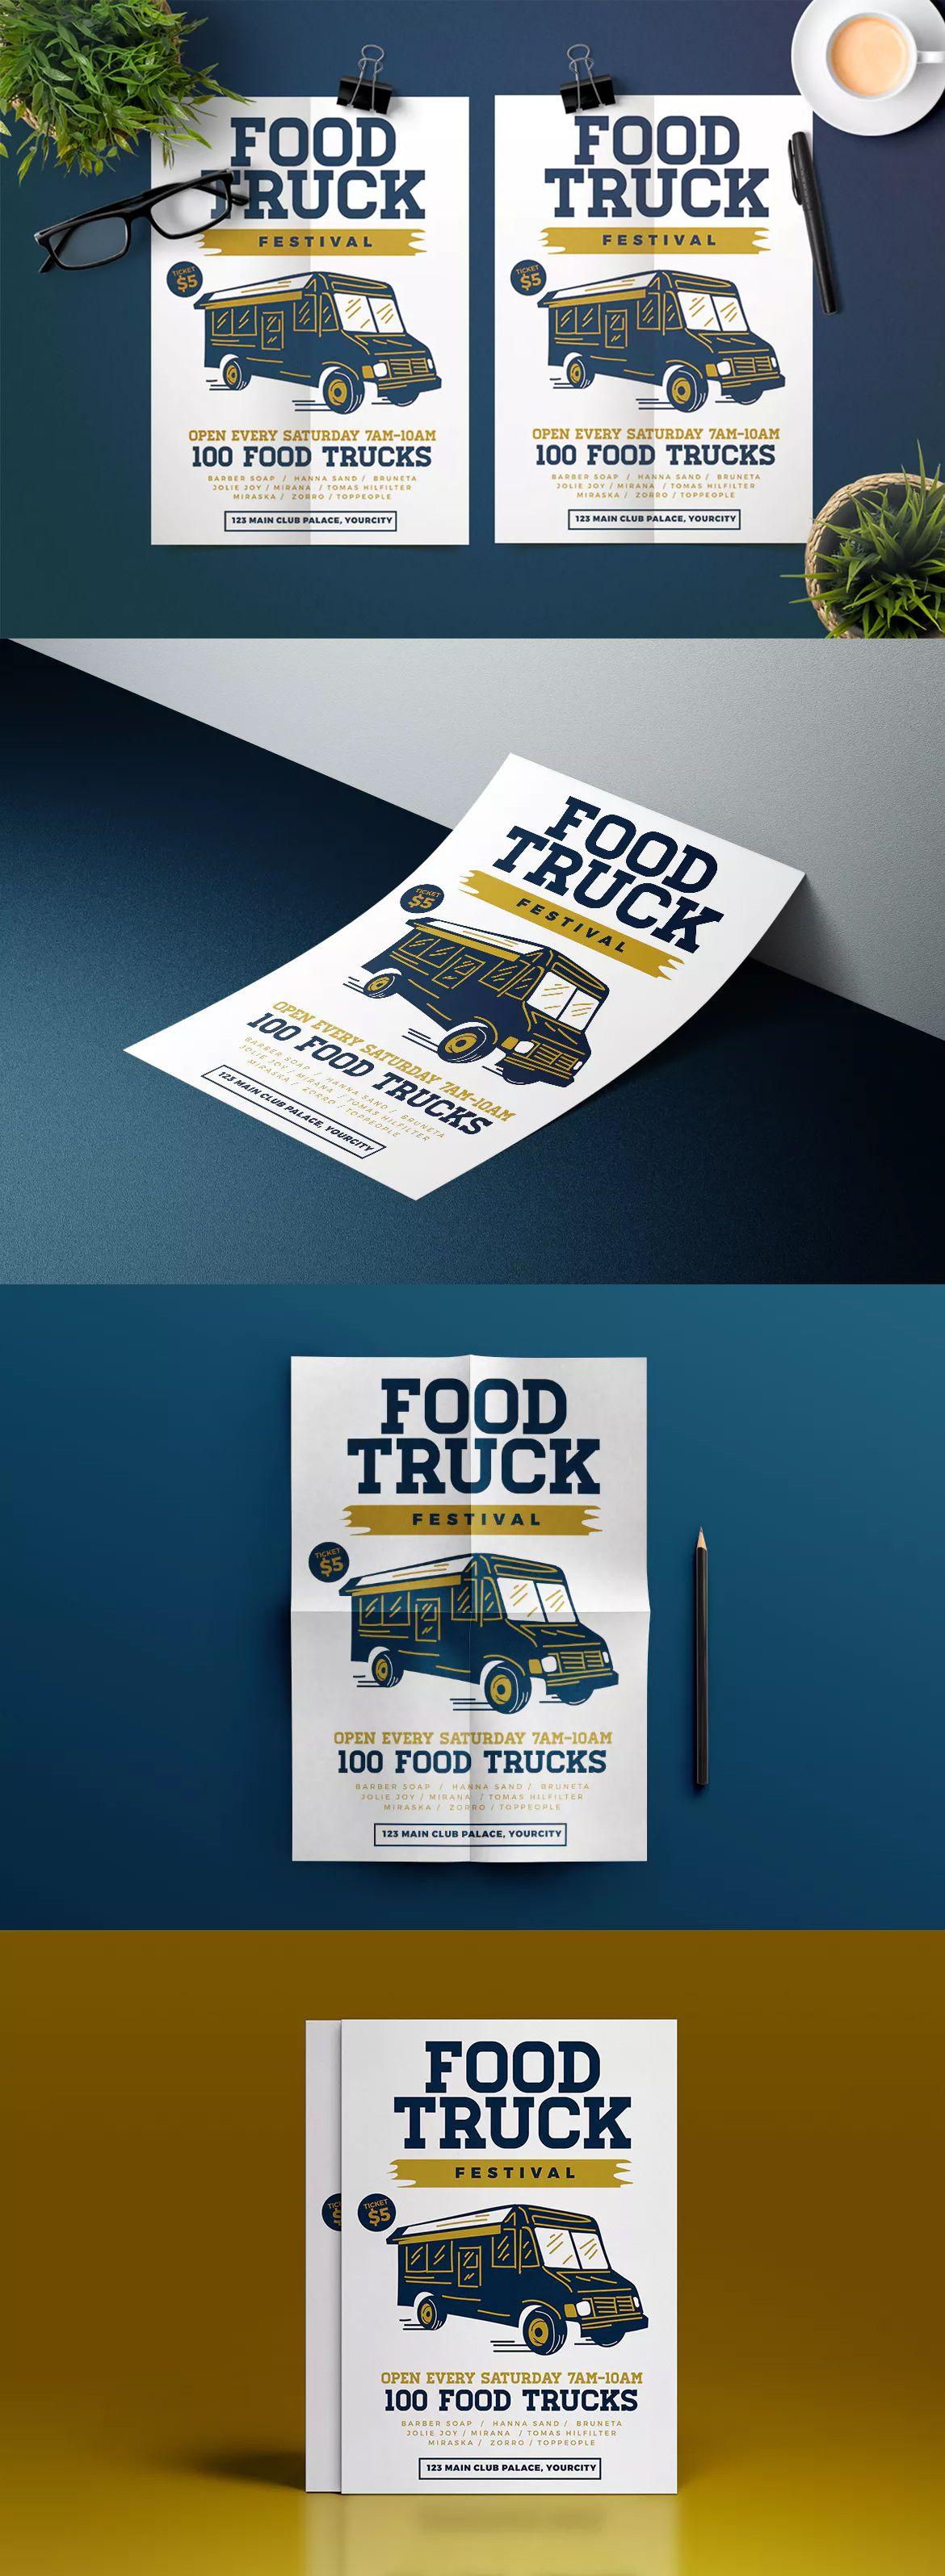 Food Truck Flyer Template AI PSD Unlimiteddownloads Food Flyer - Food truck flyer template